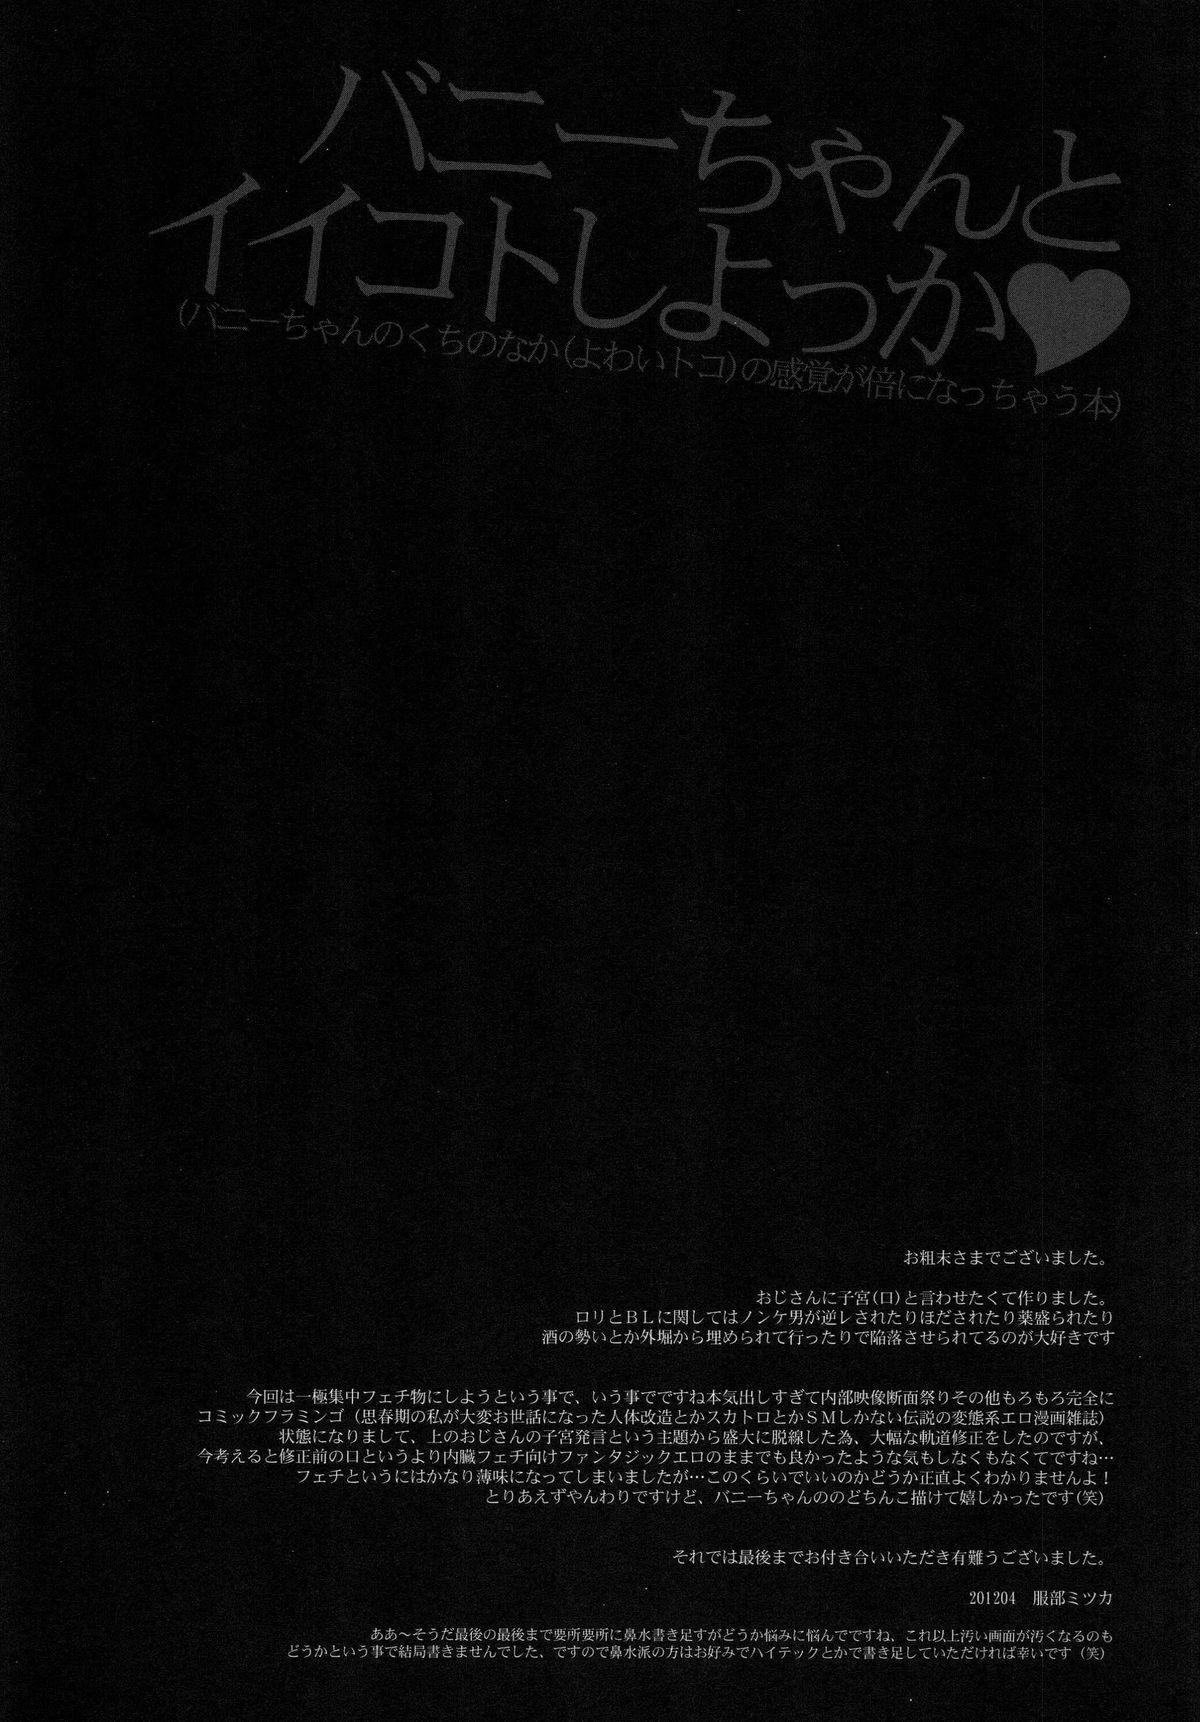 Bunny-chan to Iikoto Shiyokka 36